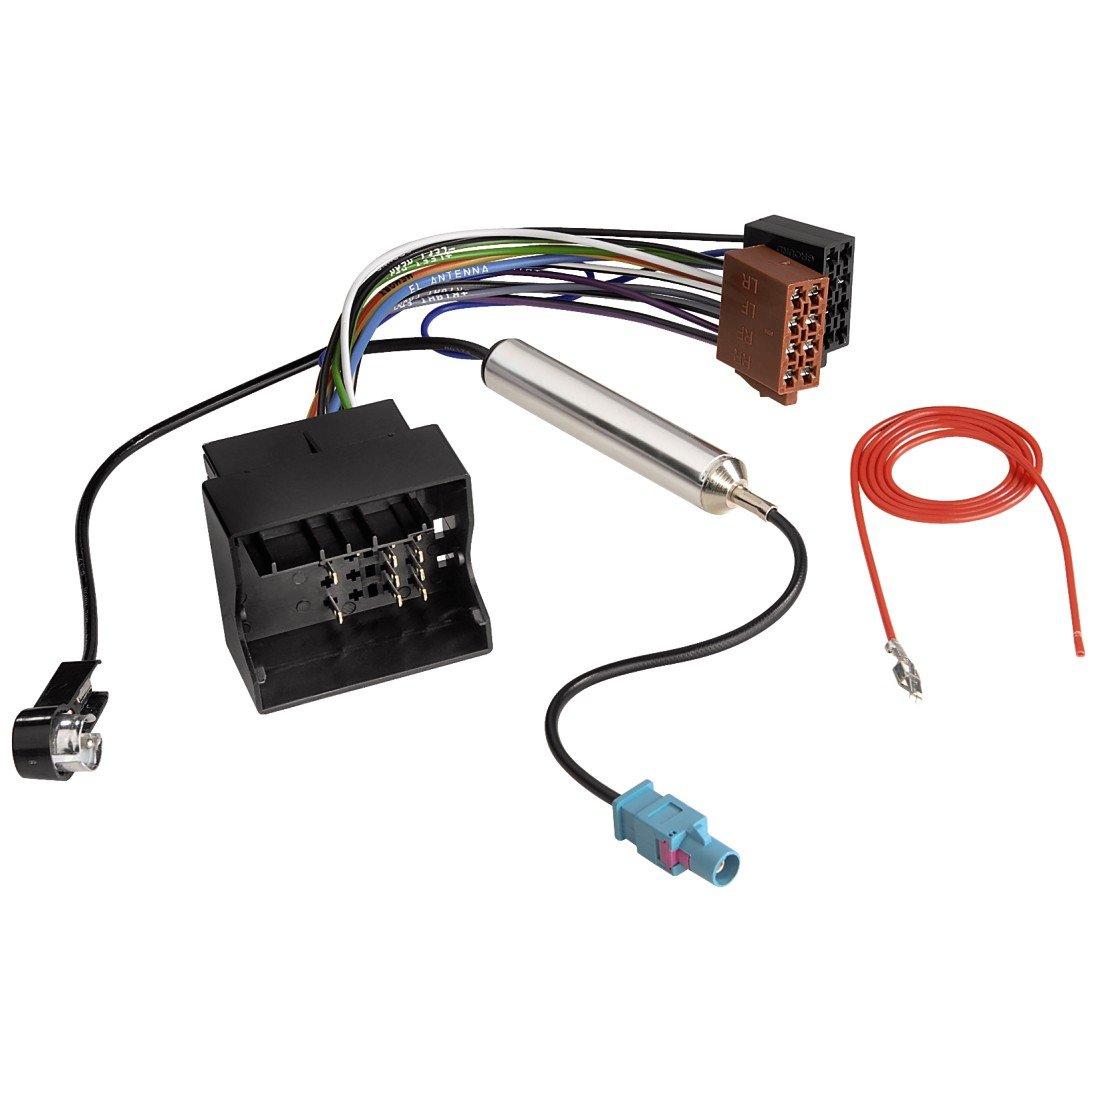 Hama Kfz-ISO-Adapter mit Phantomeinspeisung fü r AUDI + VW 00080720 Car-HiFi